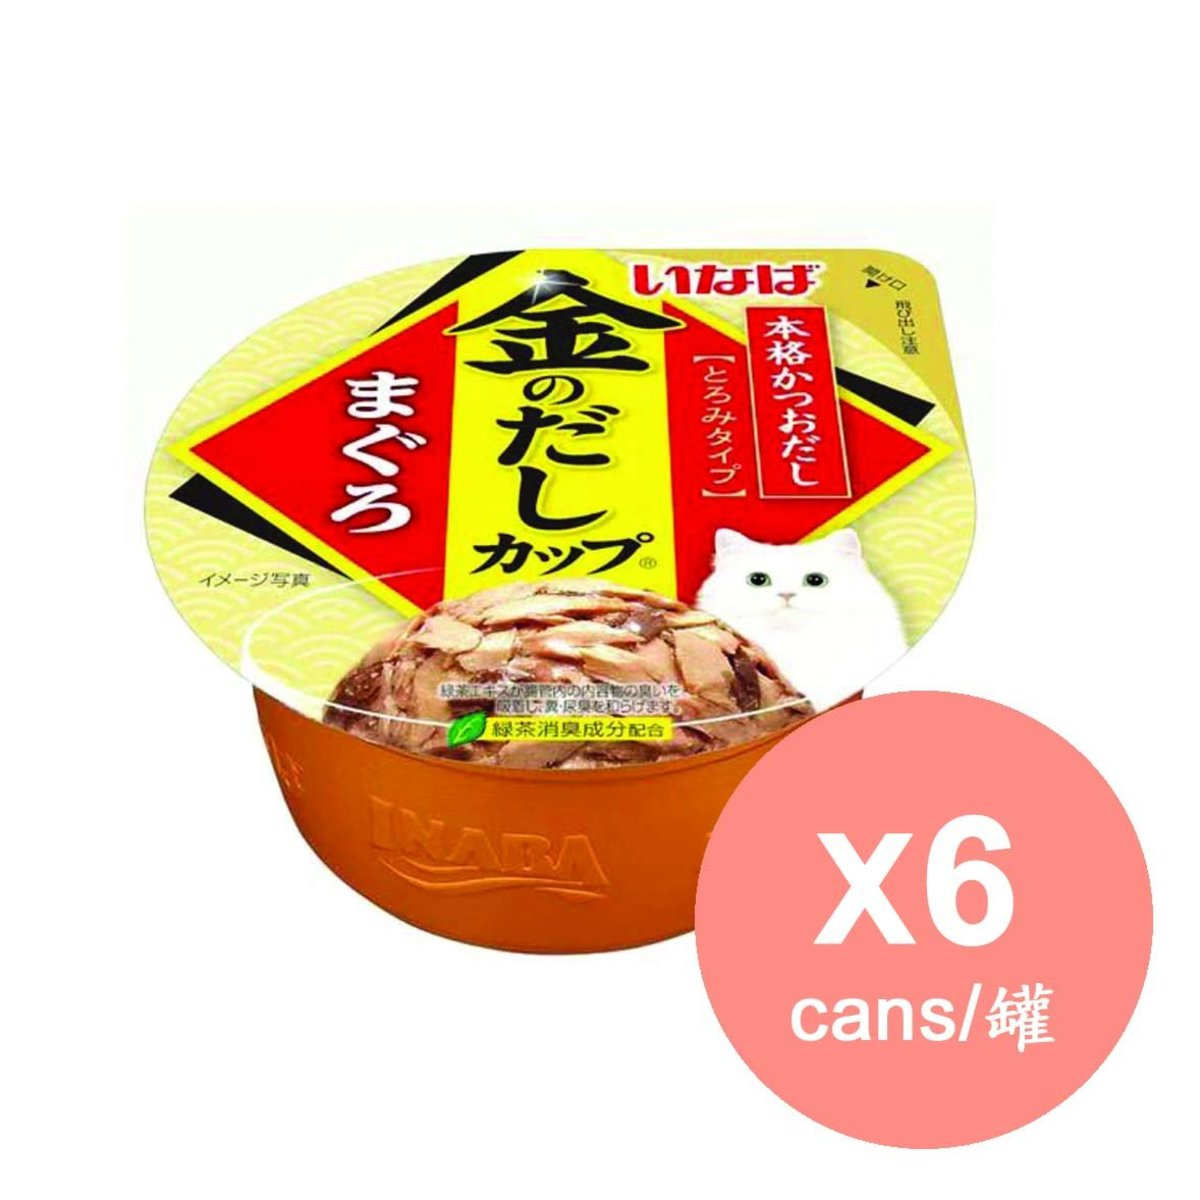 KINNODASHI CUP Maguro 70g x6